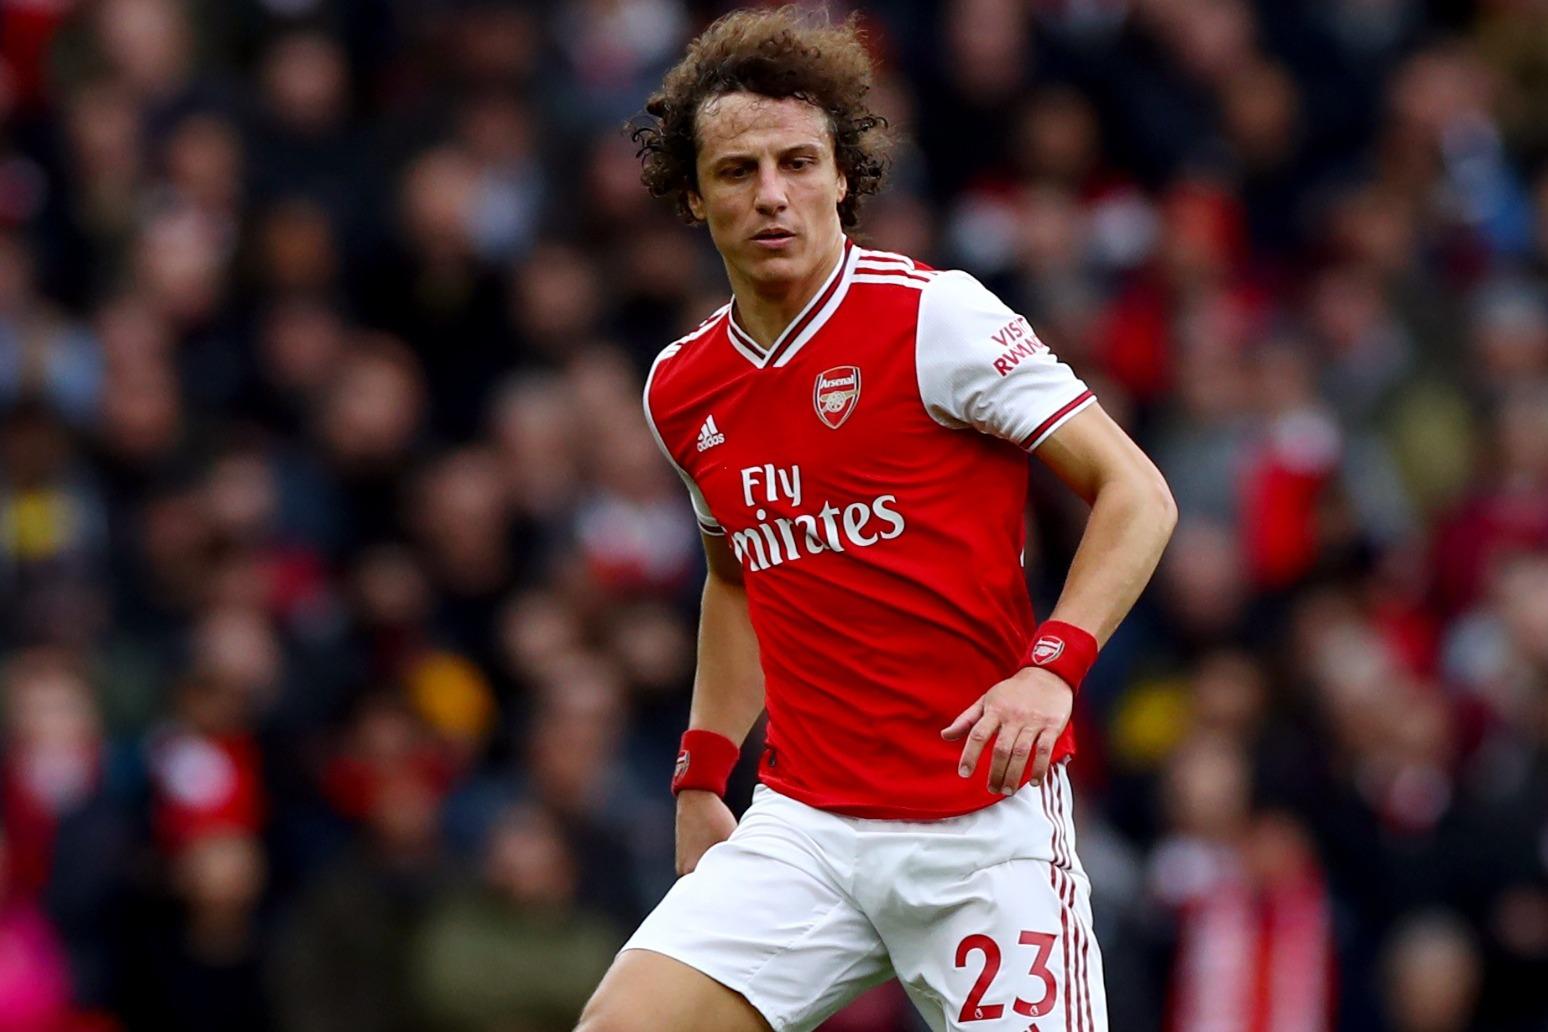 David Luiz agrees new one-year Arsenal deal despite poor display at Man City